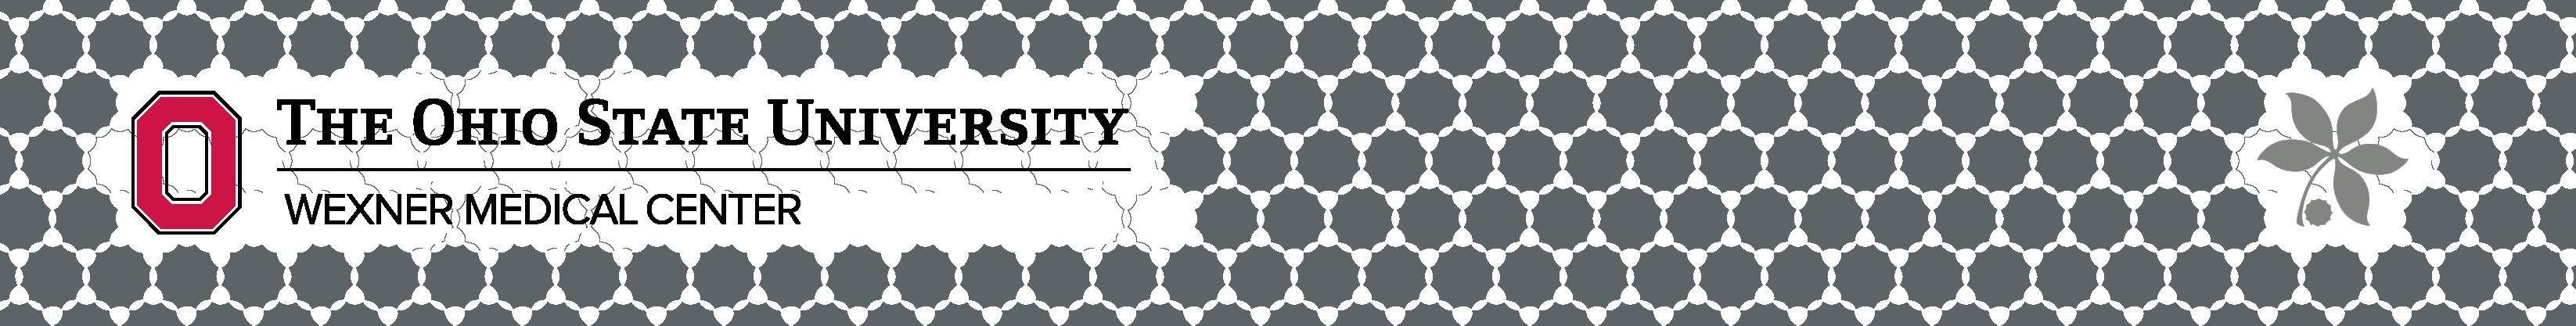 AbstractHeadersForCVent-05